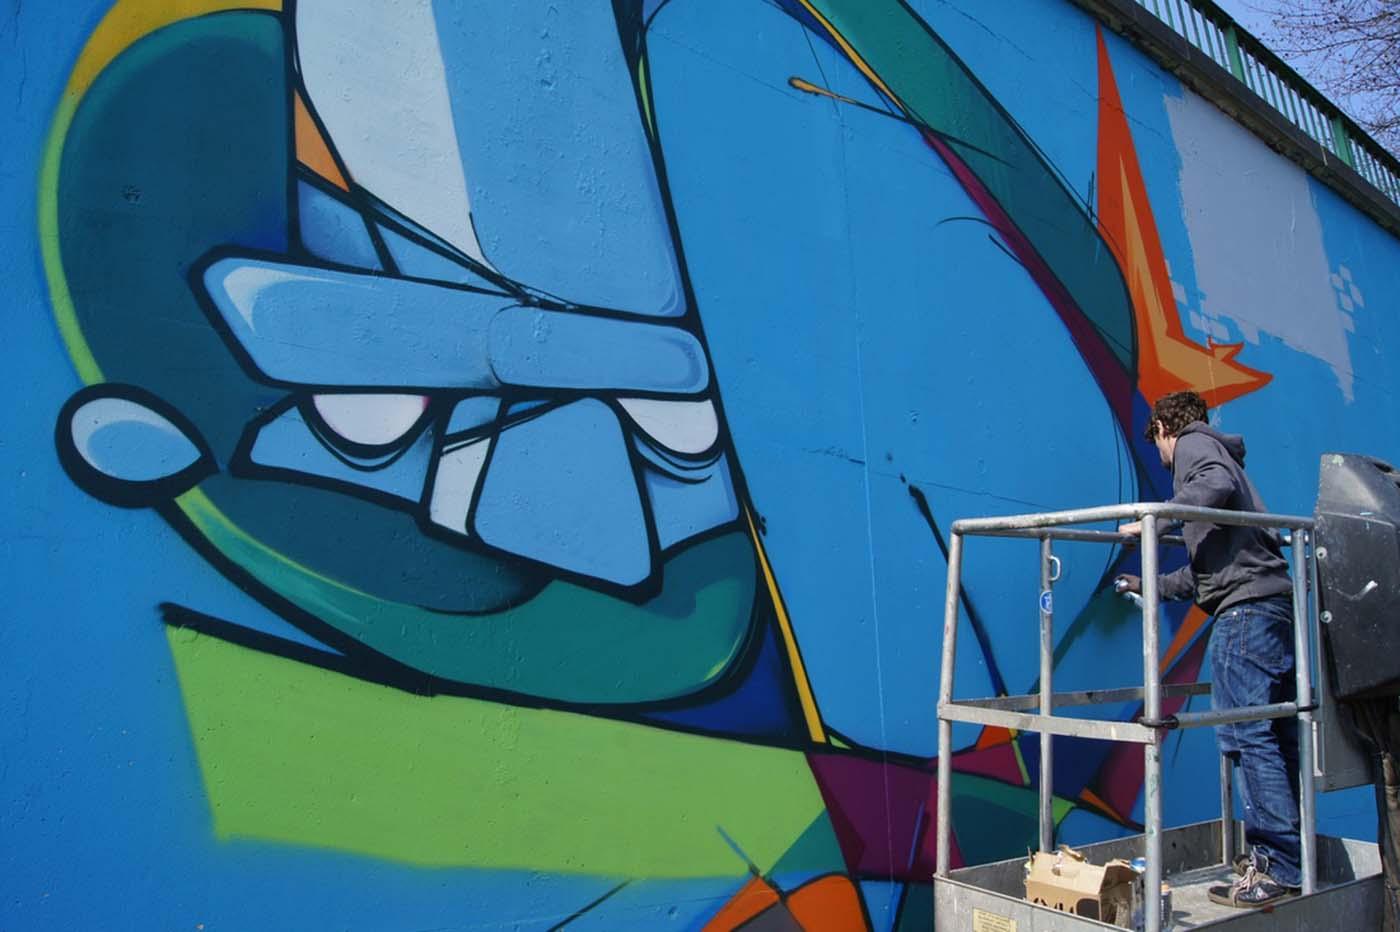 https://www.propaganza.be/wp-content/uploads/2019/04/lediptik-propaganza-urban-artist-graffiti-graff-street-art-spray-painting-belgique-3.jpg